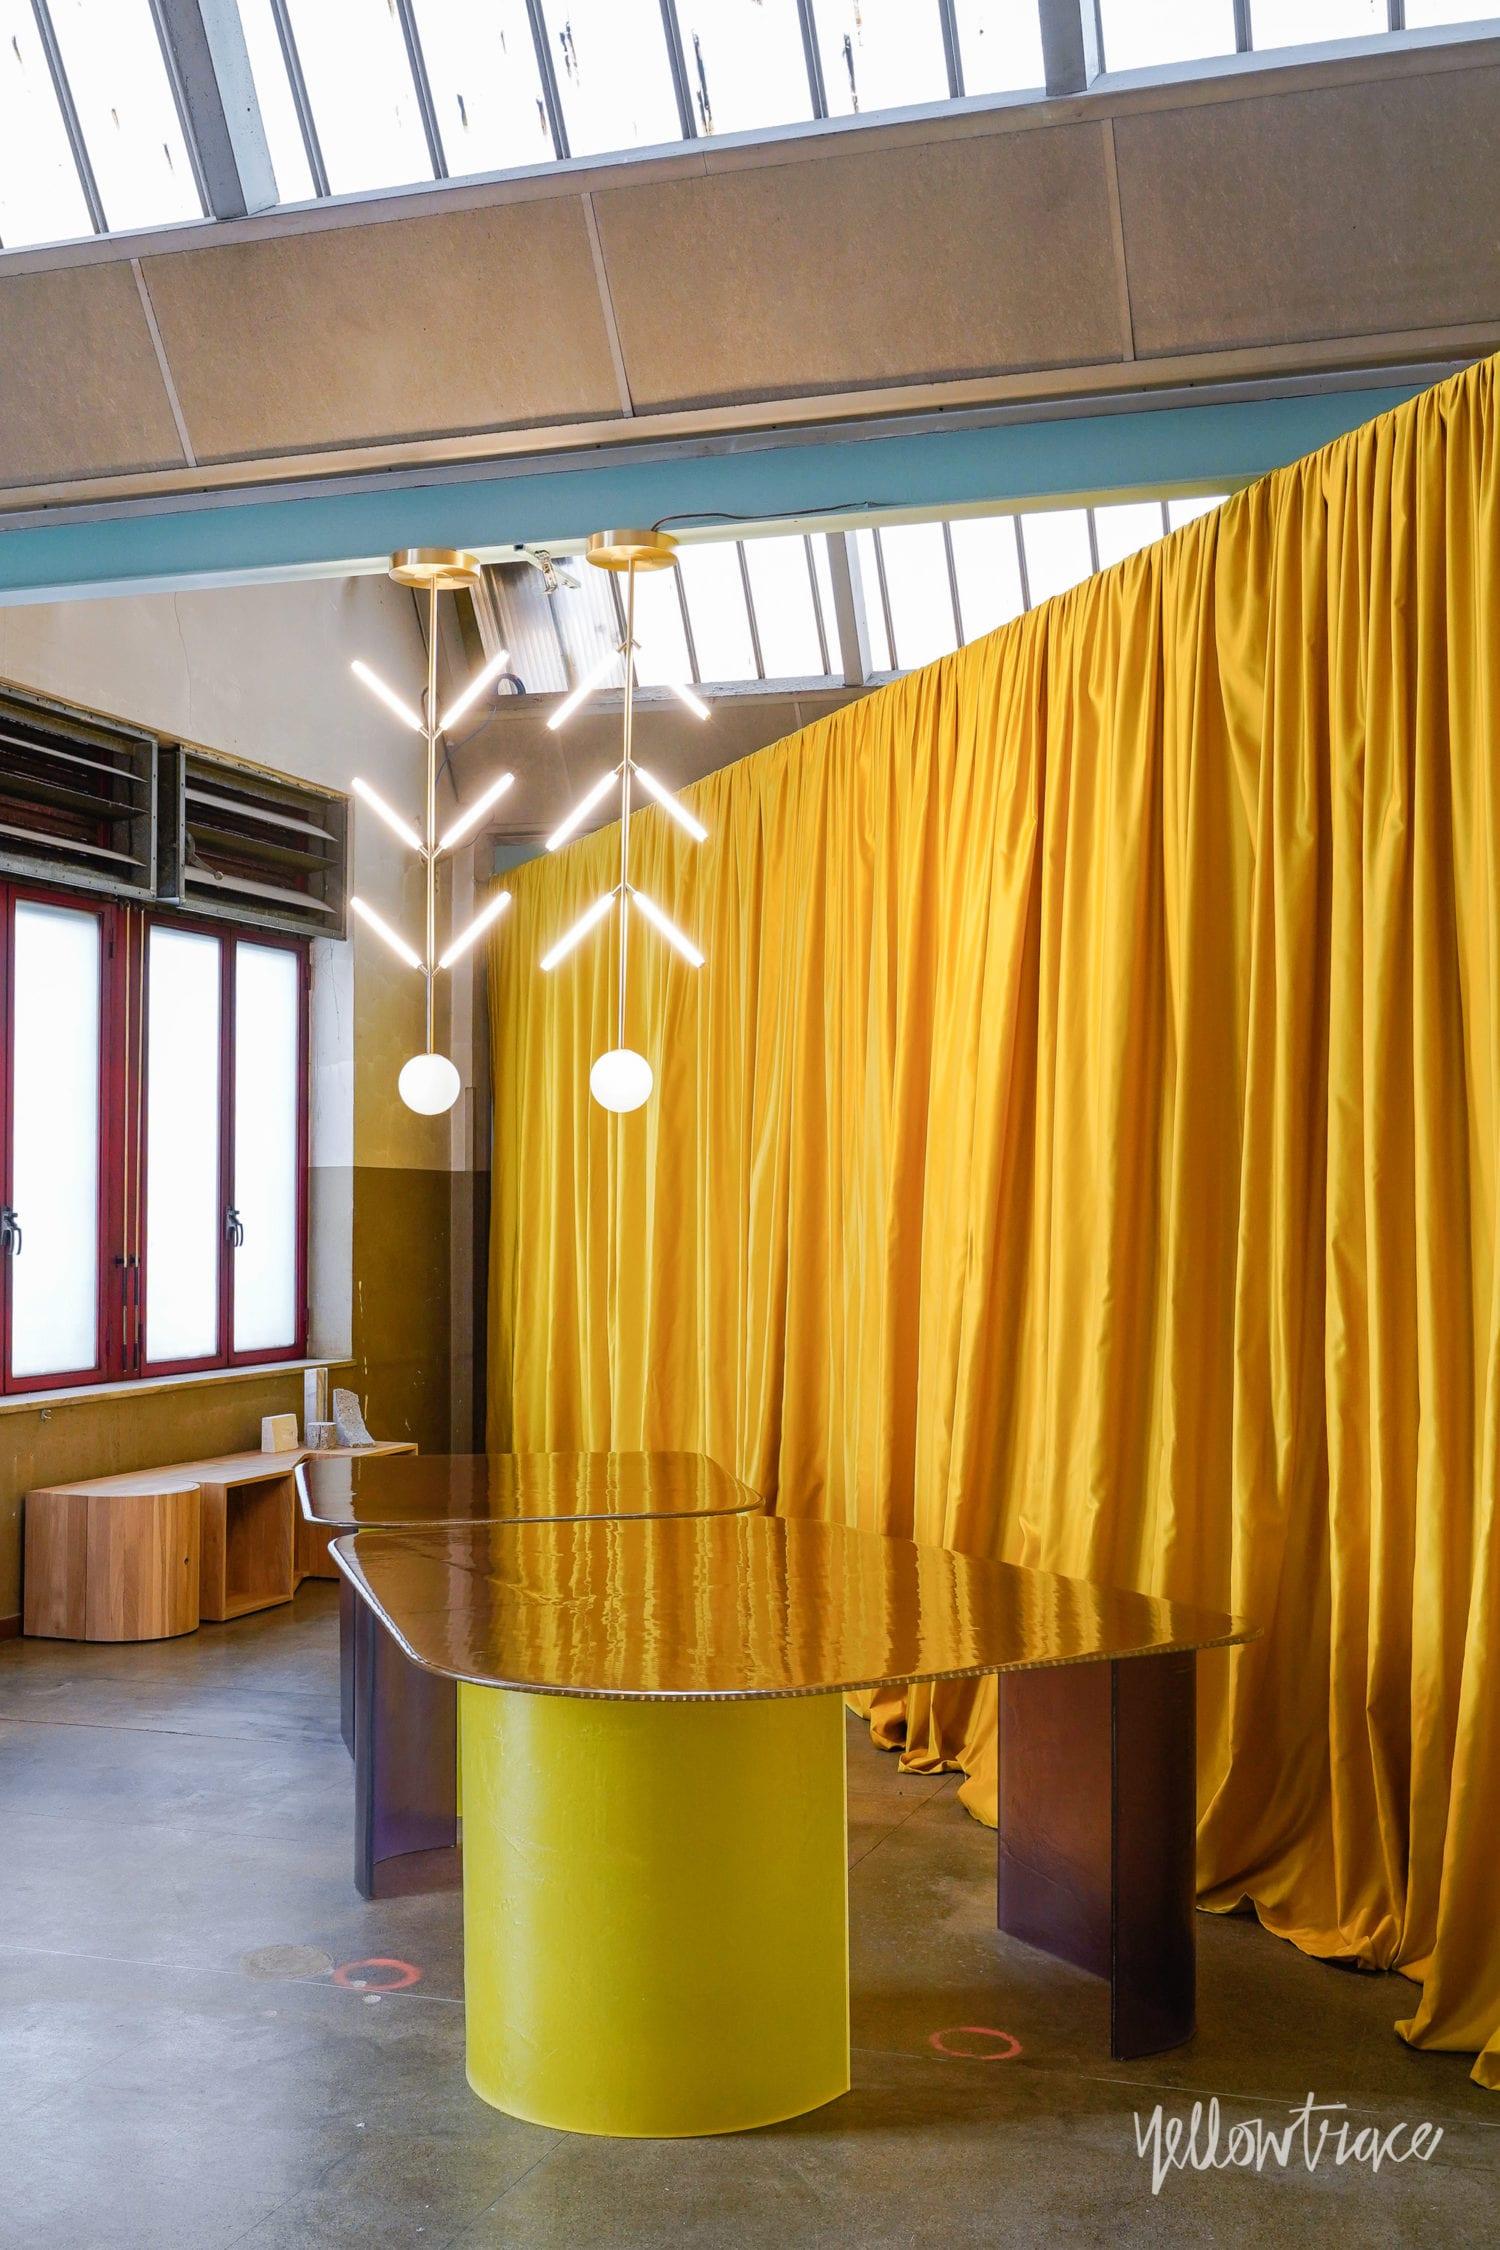 Les Arcanistes Studiopepe At Milan Design Week 2019 Photo Nick Hughes Yellowtrace 01